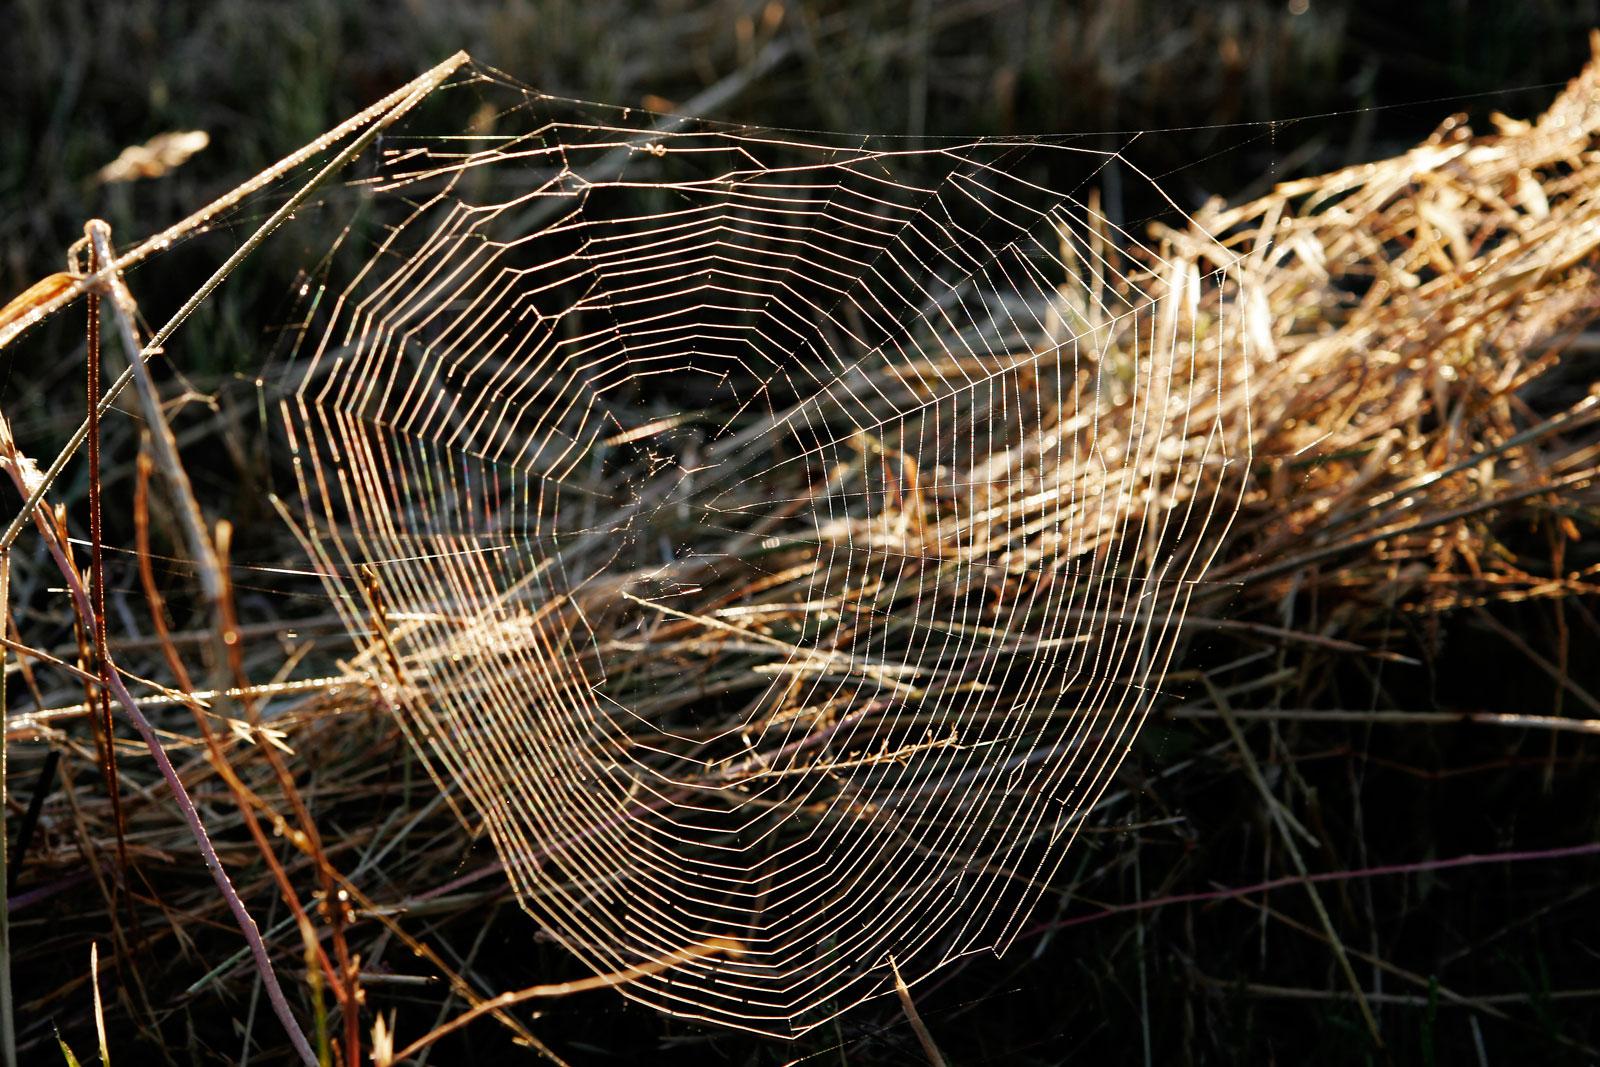 filet d'araignée